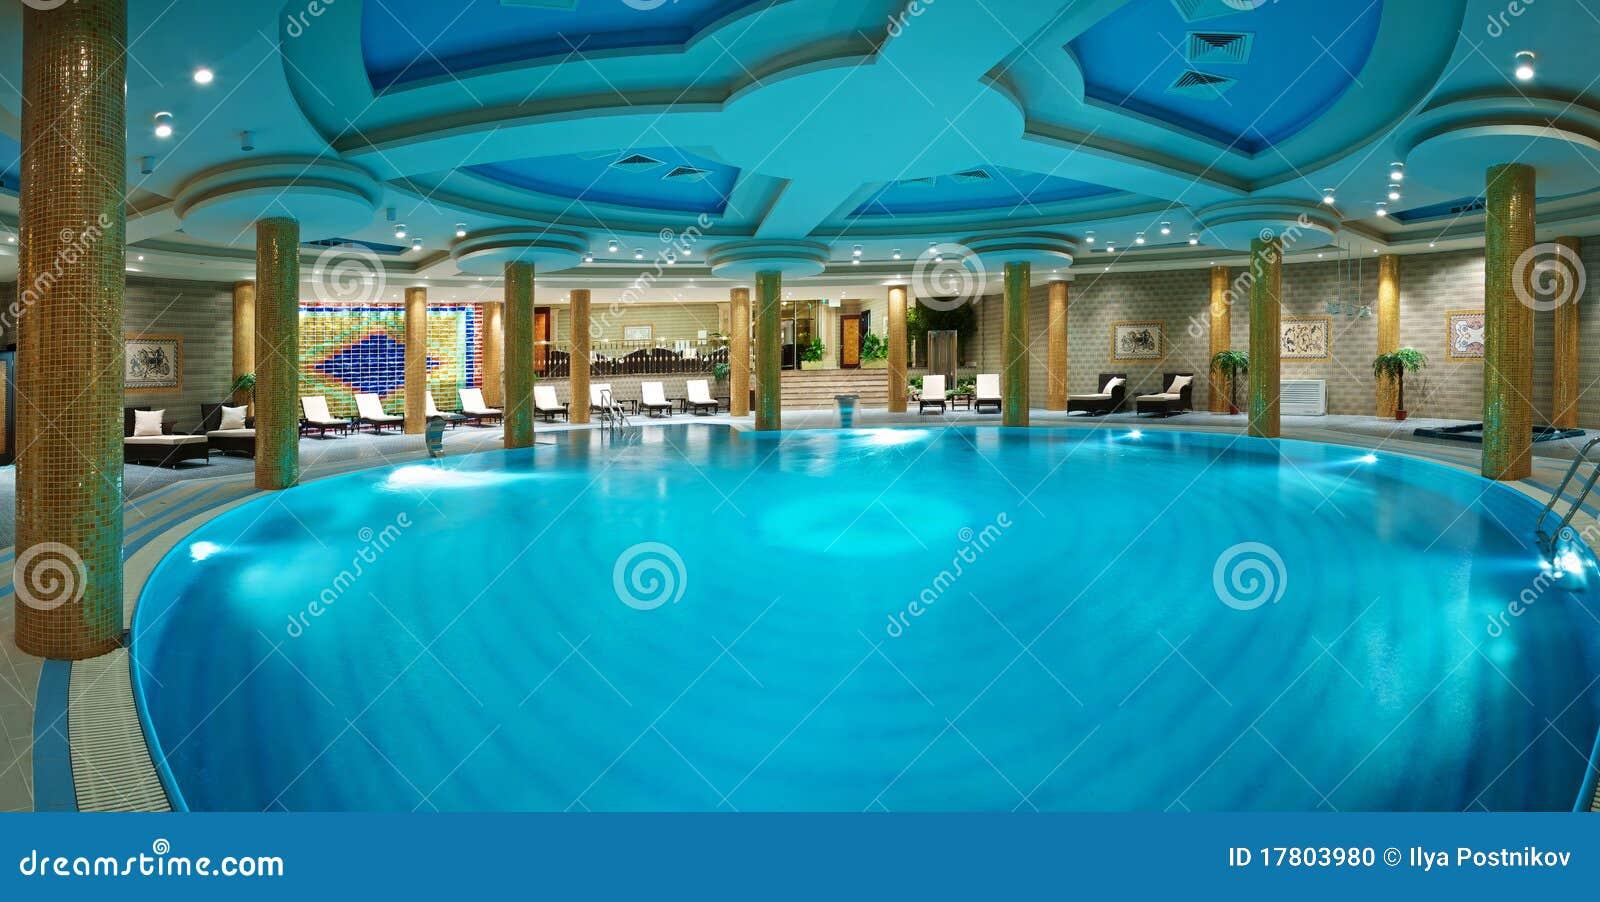 Piscinas luxuosas foto de stock imagem 17803980 - Business plan piscina ...